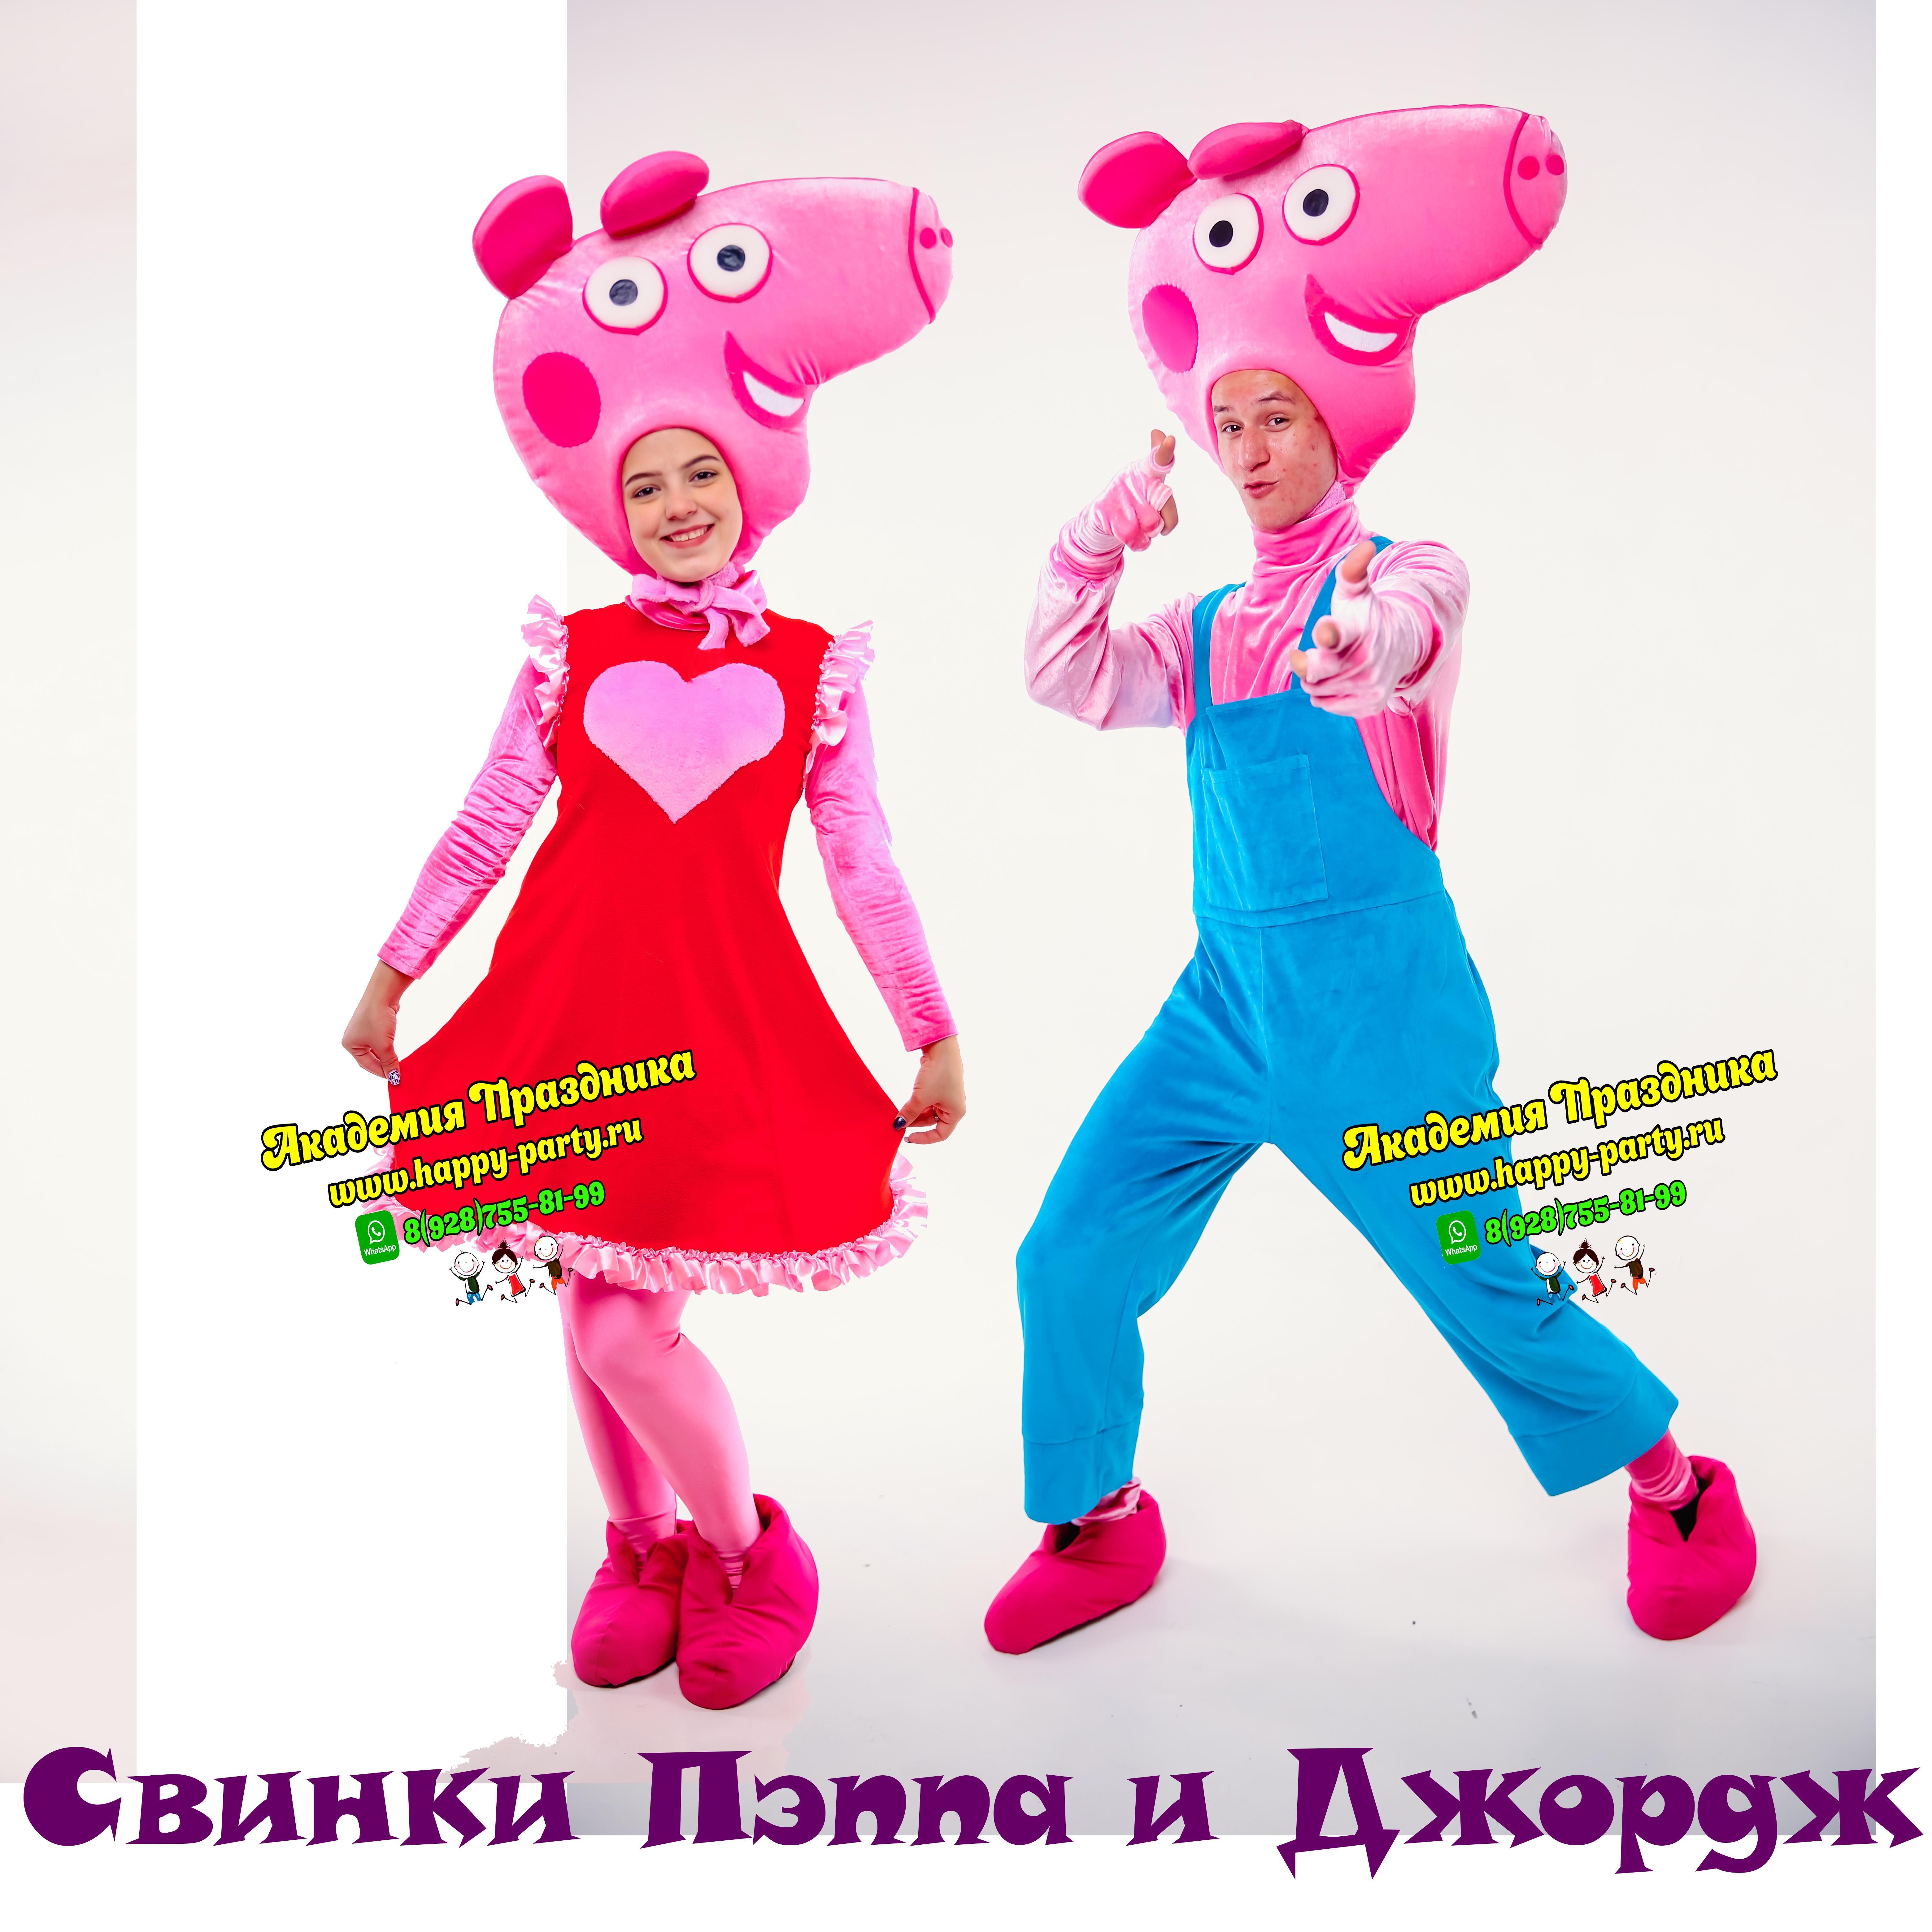 аниматор свинка пеппа и джордж